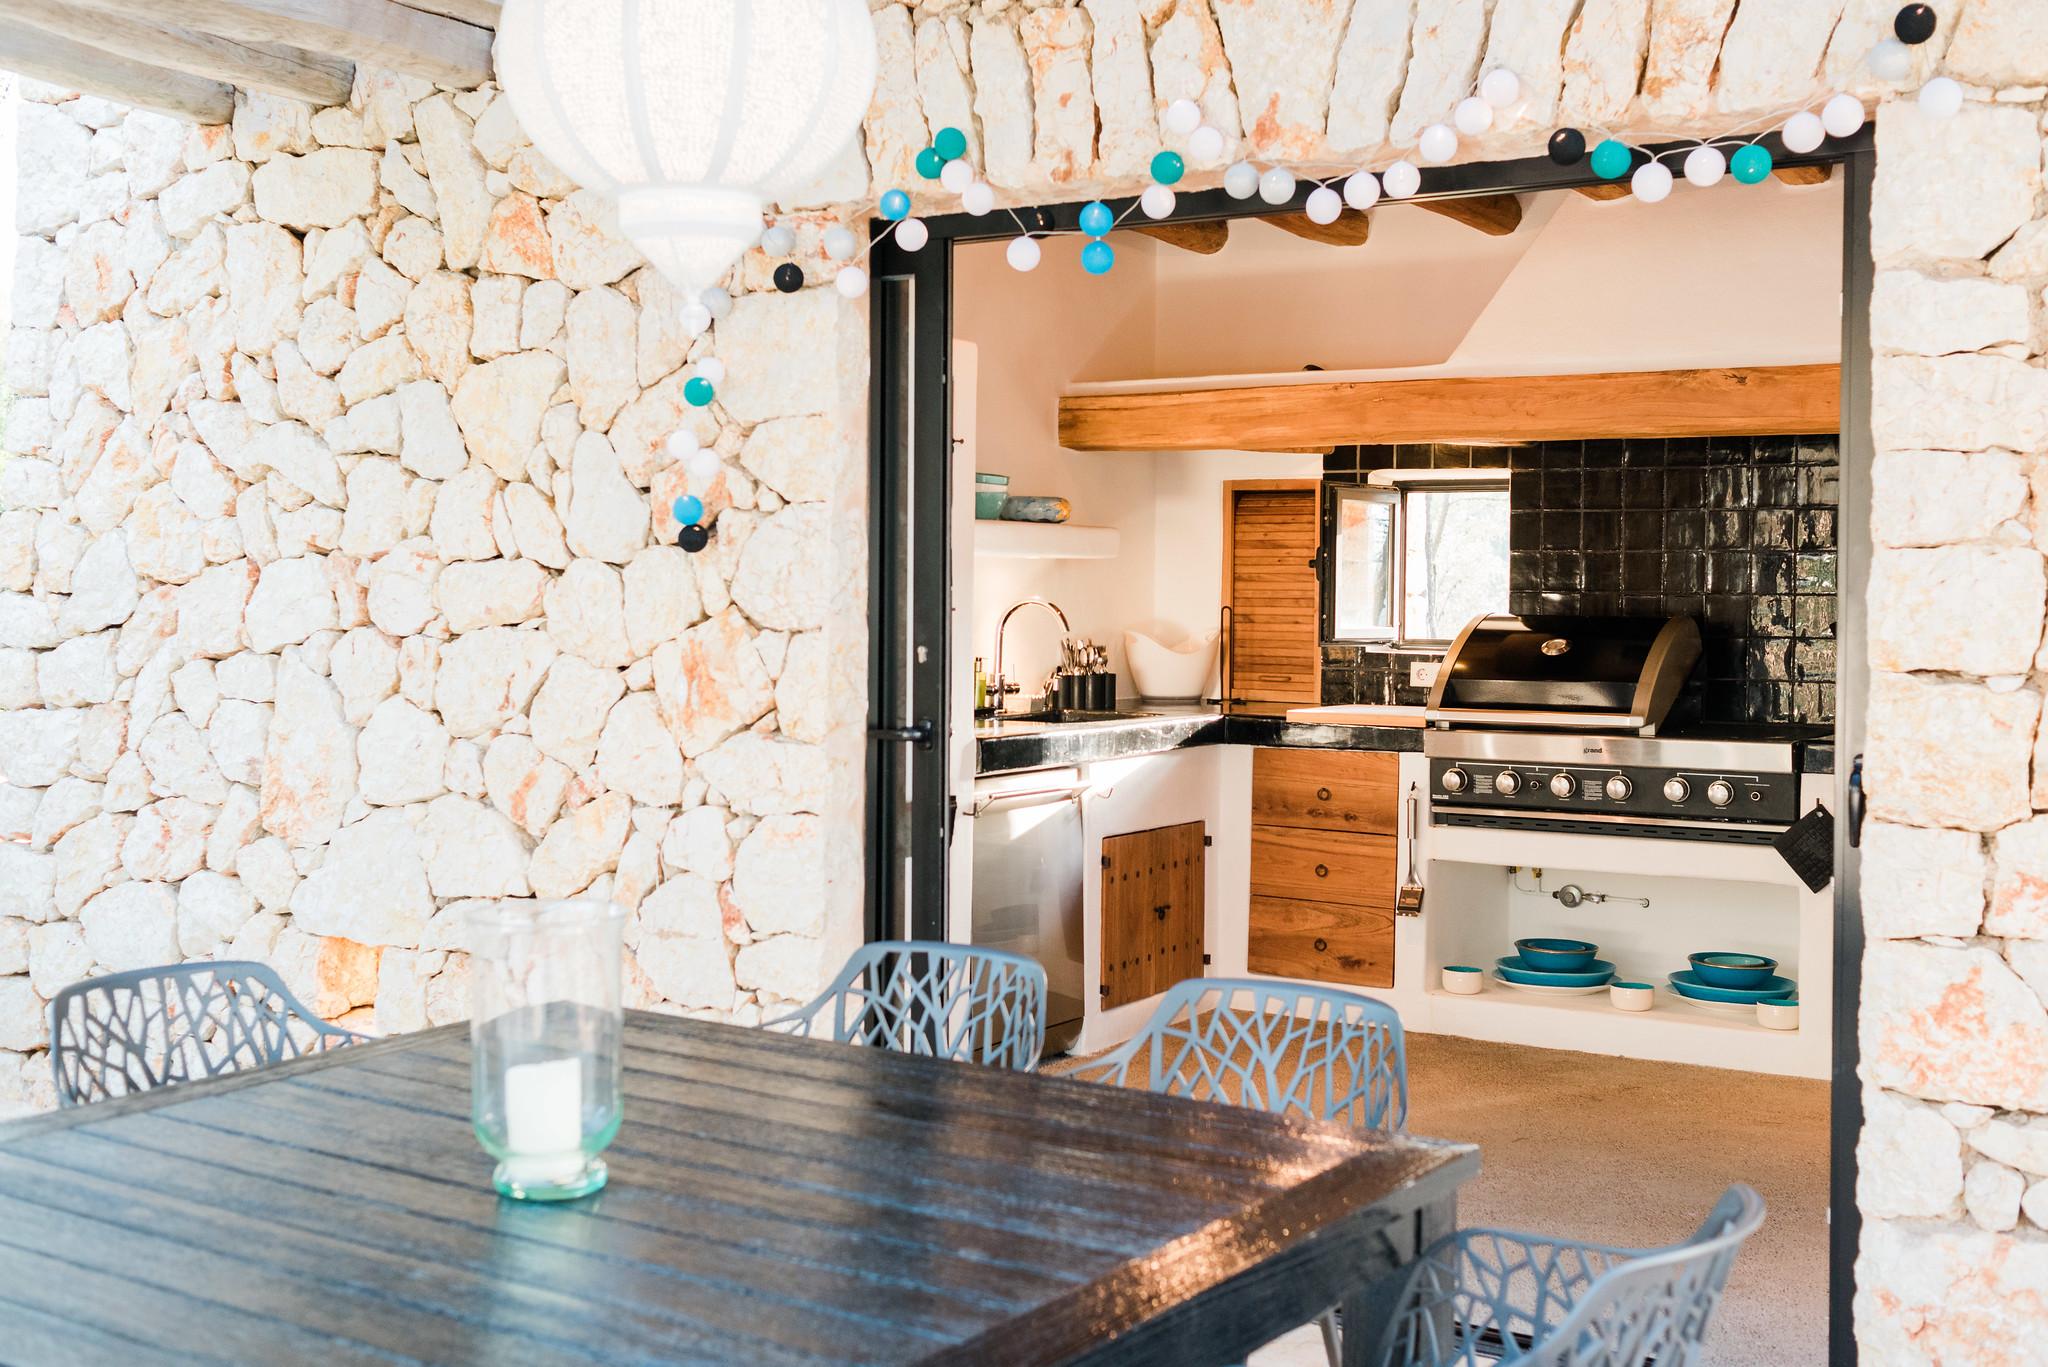 https://www.white-ibiza.com/wp-content/uploads/2020/05/white-ibiza-villas-can-terra-outside-kitchen-1.jpg